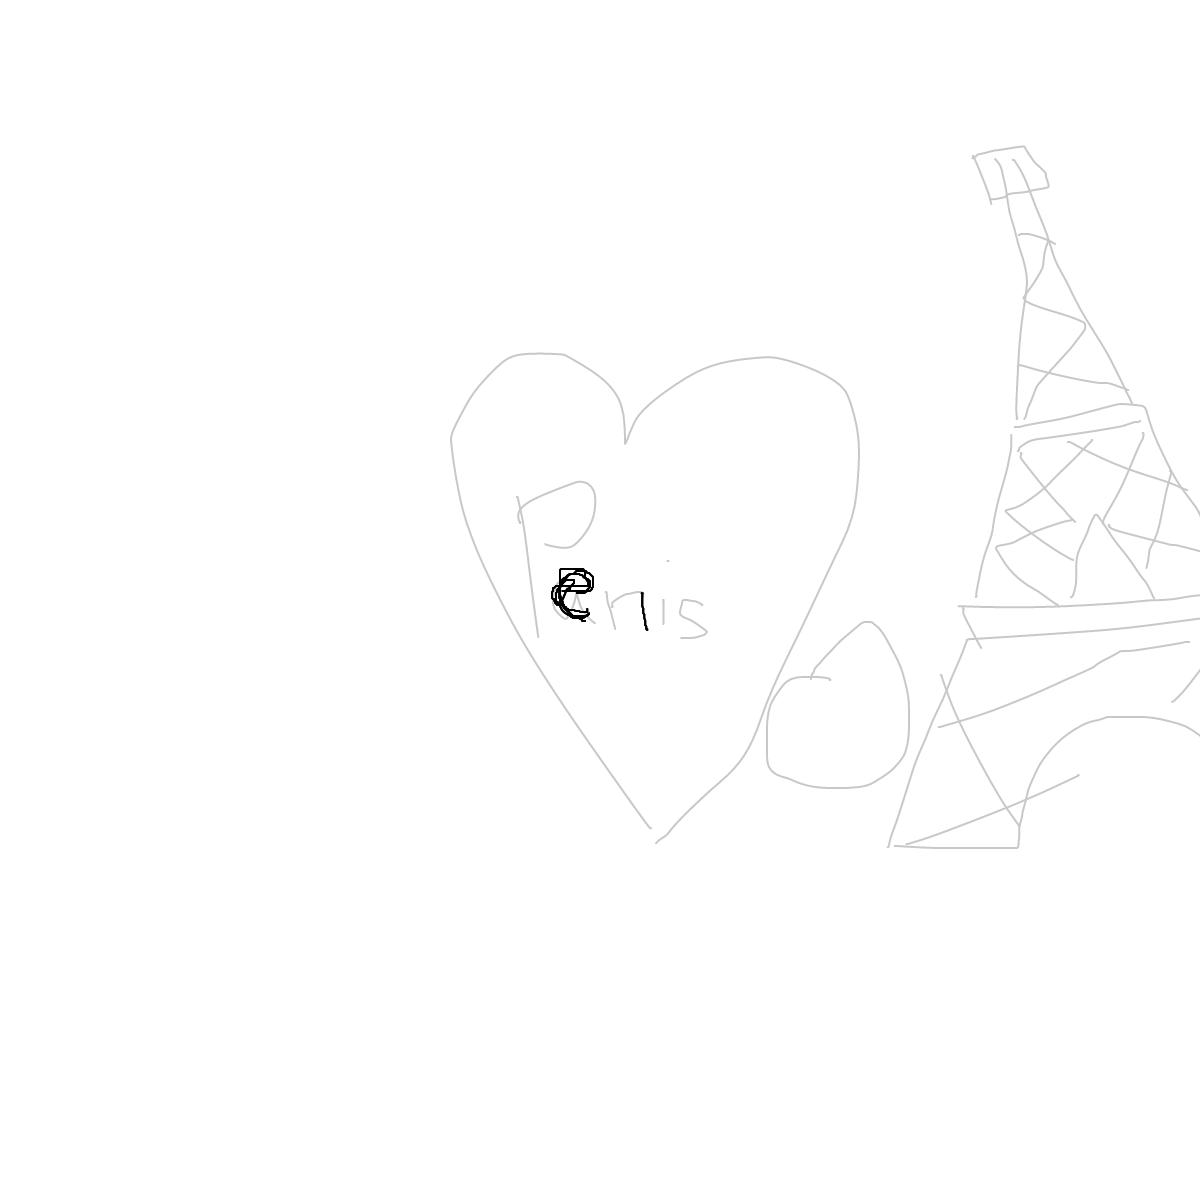 BAAAM drawing#7897 lat:48.8718719482421900lng: 2.3176202774047850